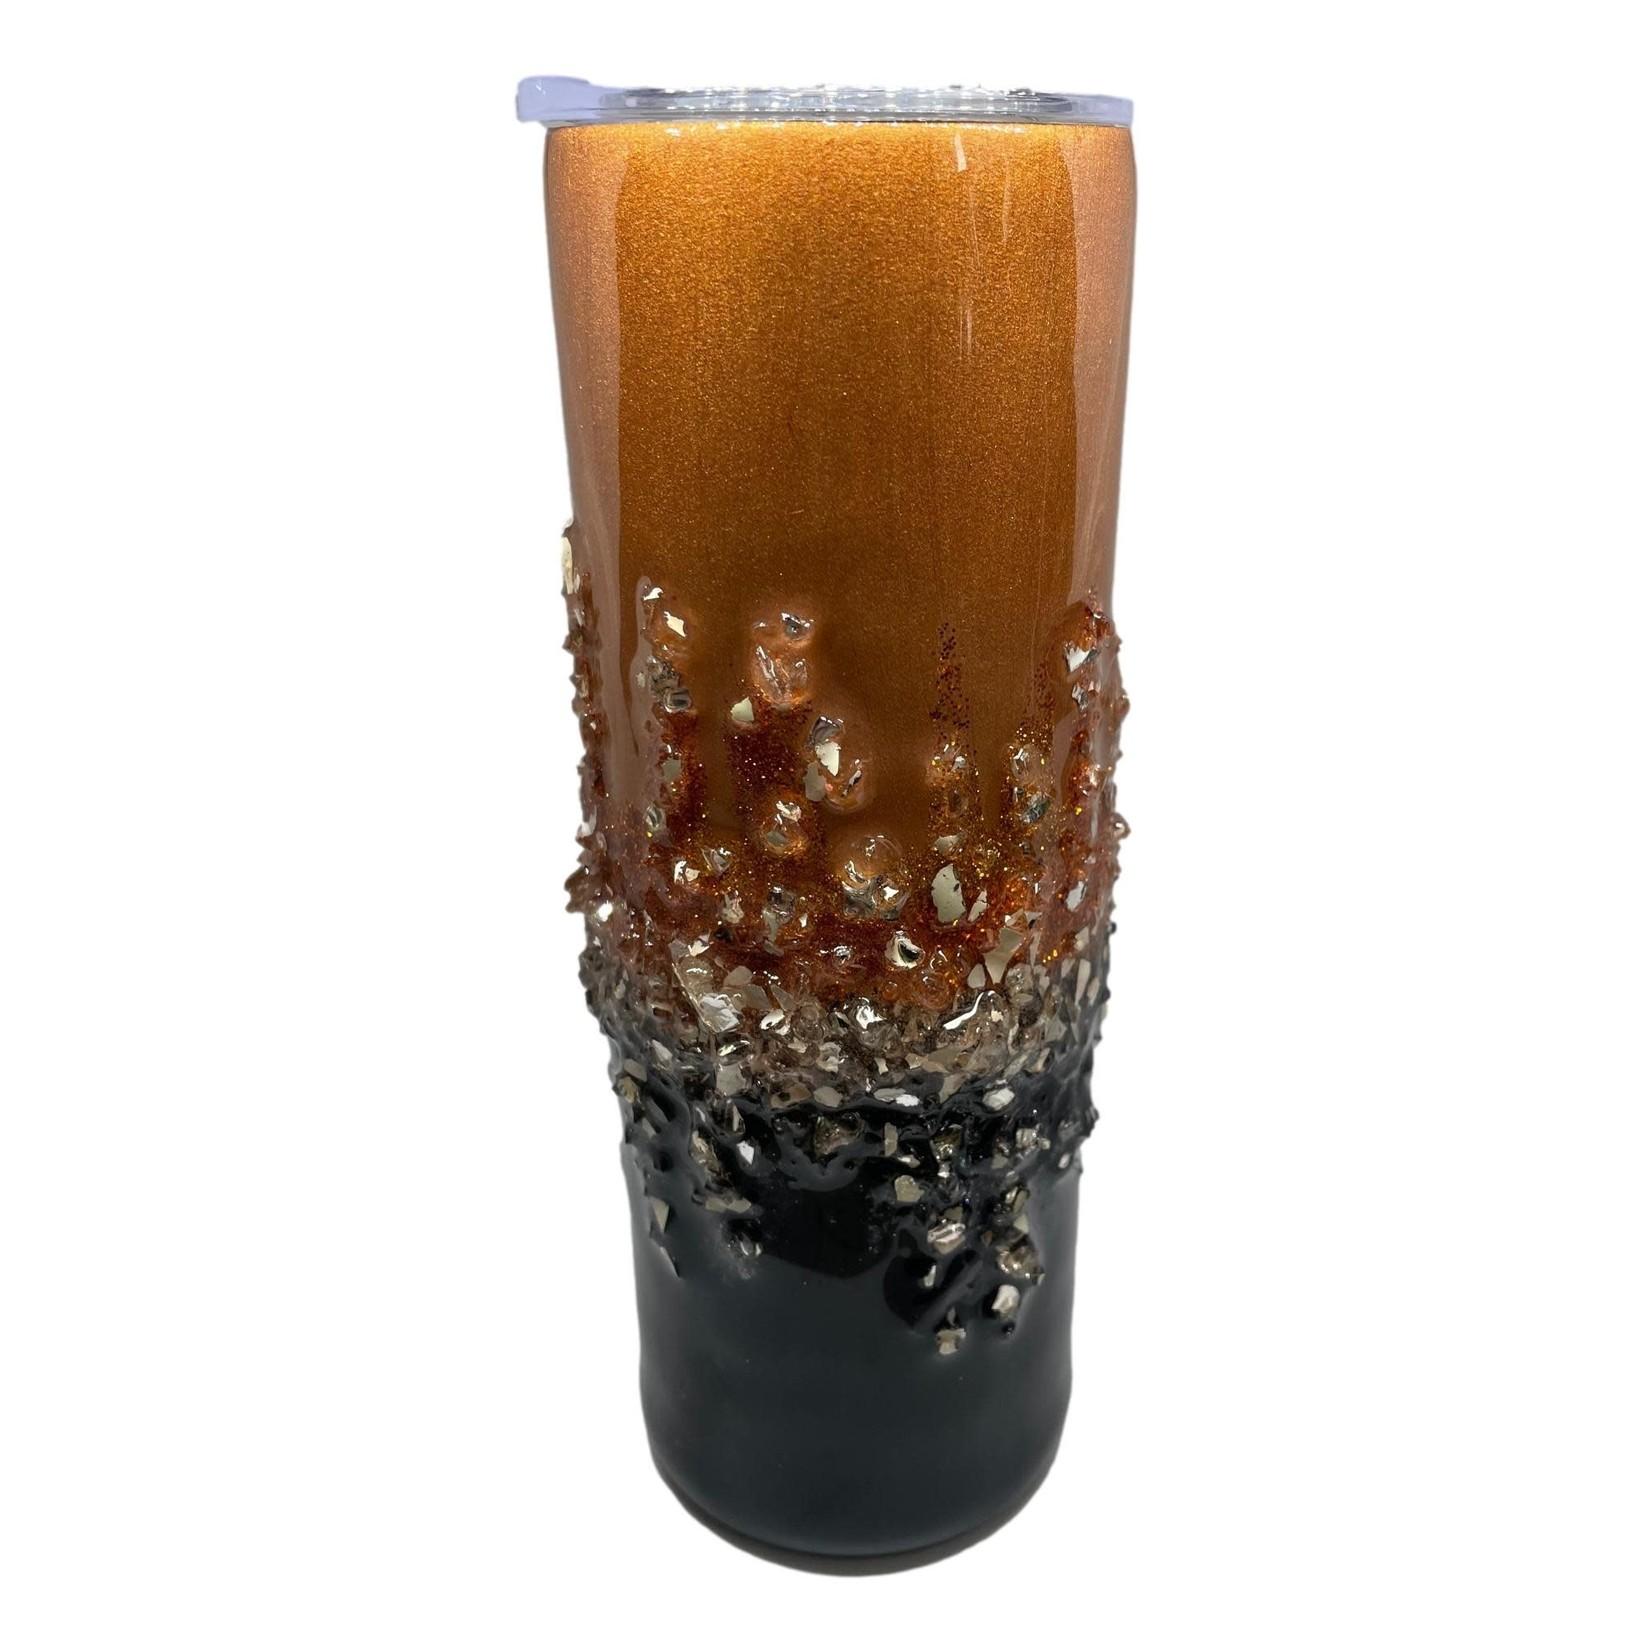 East Coast Sirens Black & Copper Tumbler 20oz